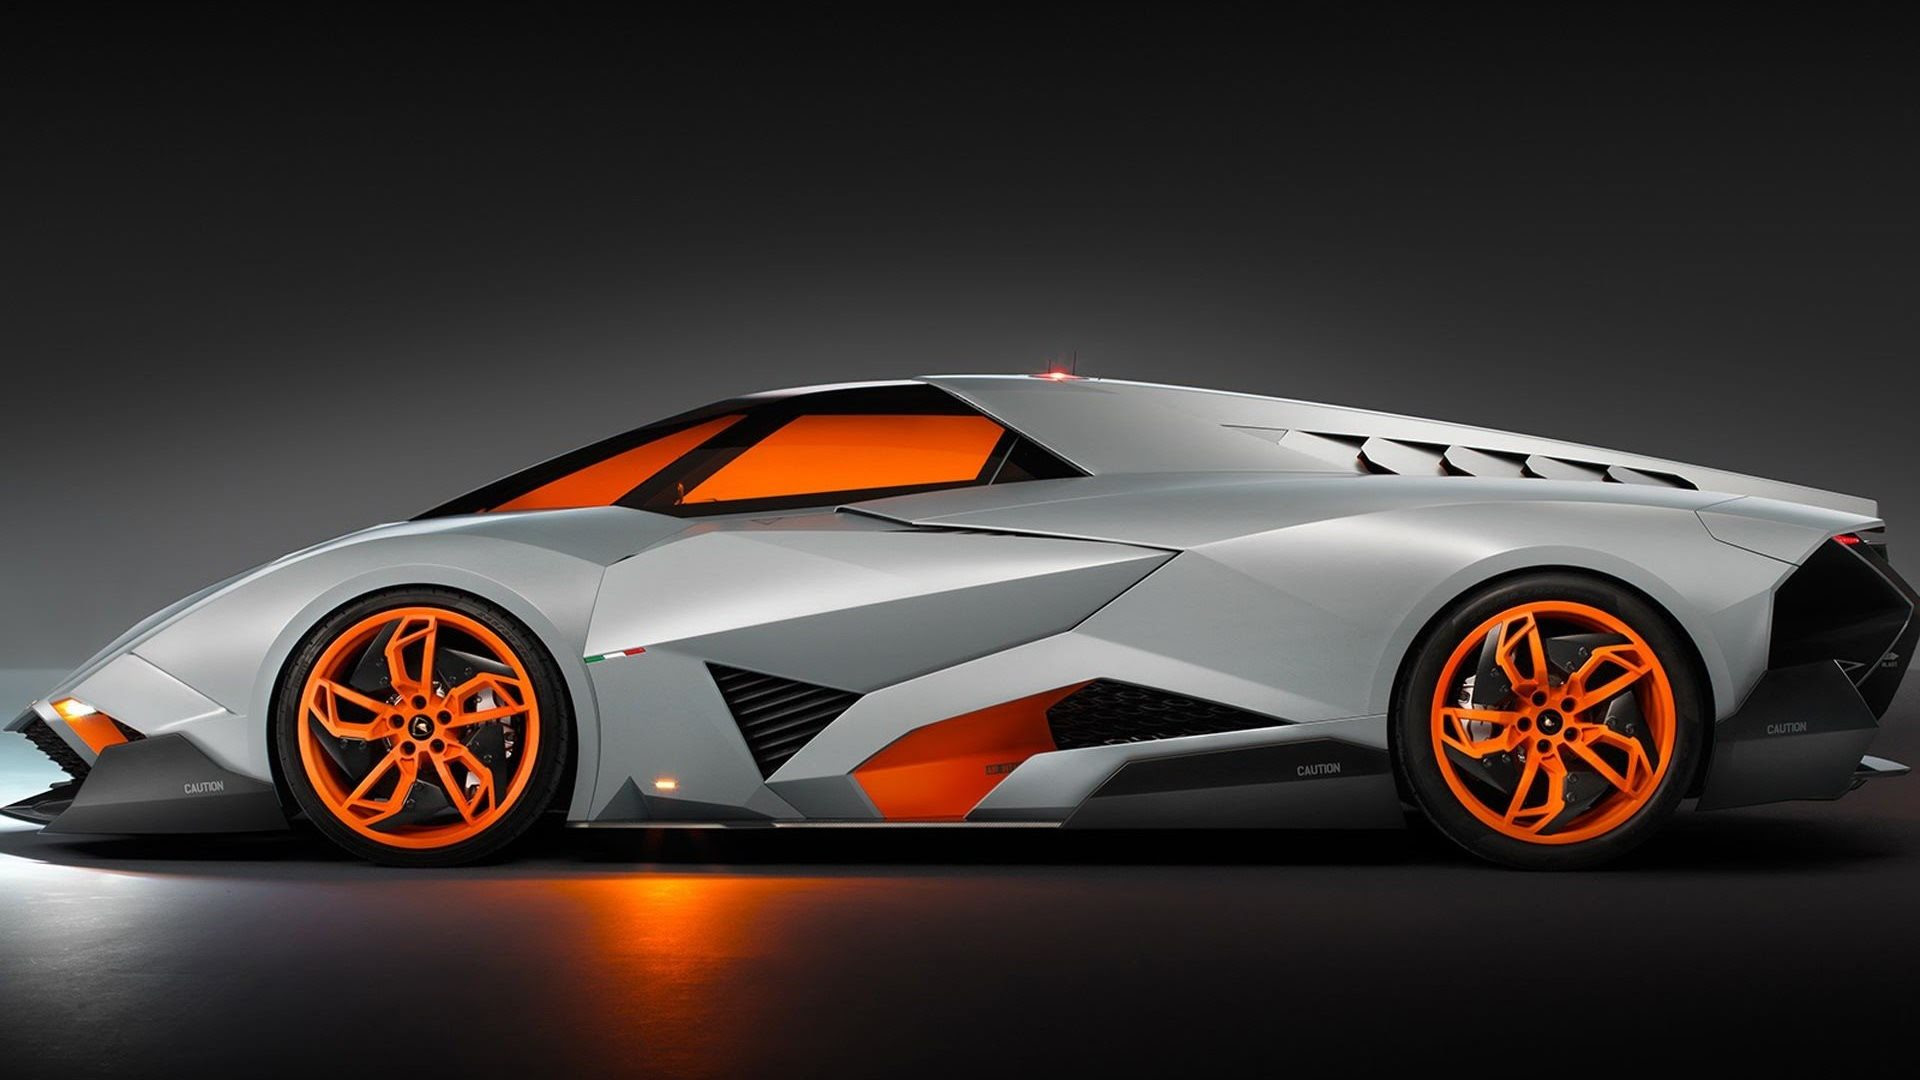 Lamborghini Aventador Wallpaper 1920x1080 41401